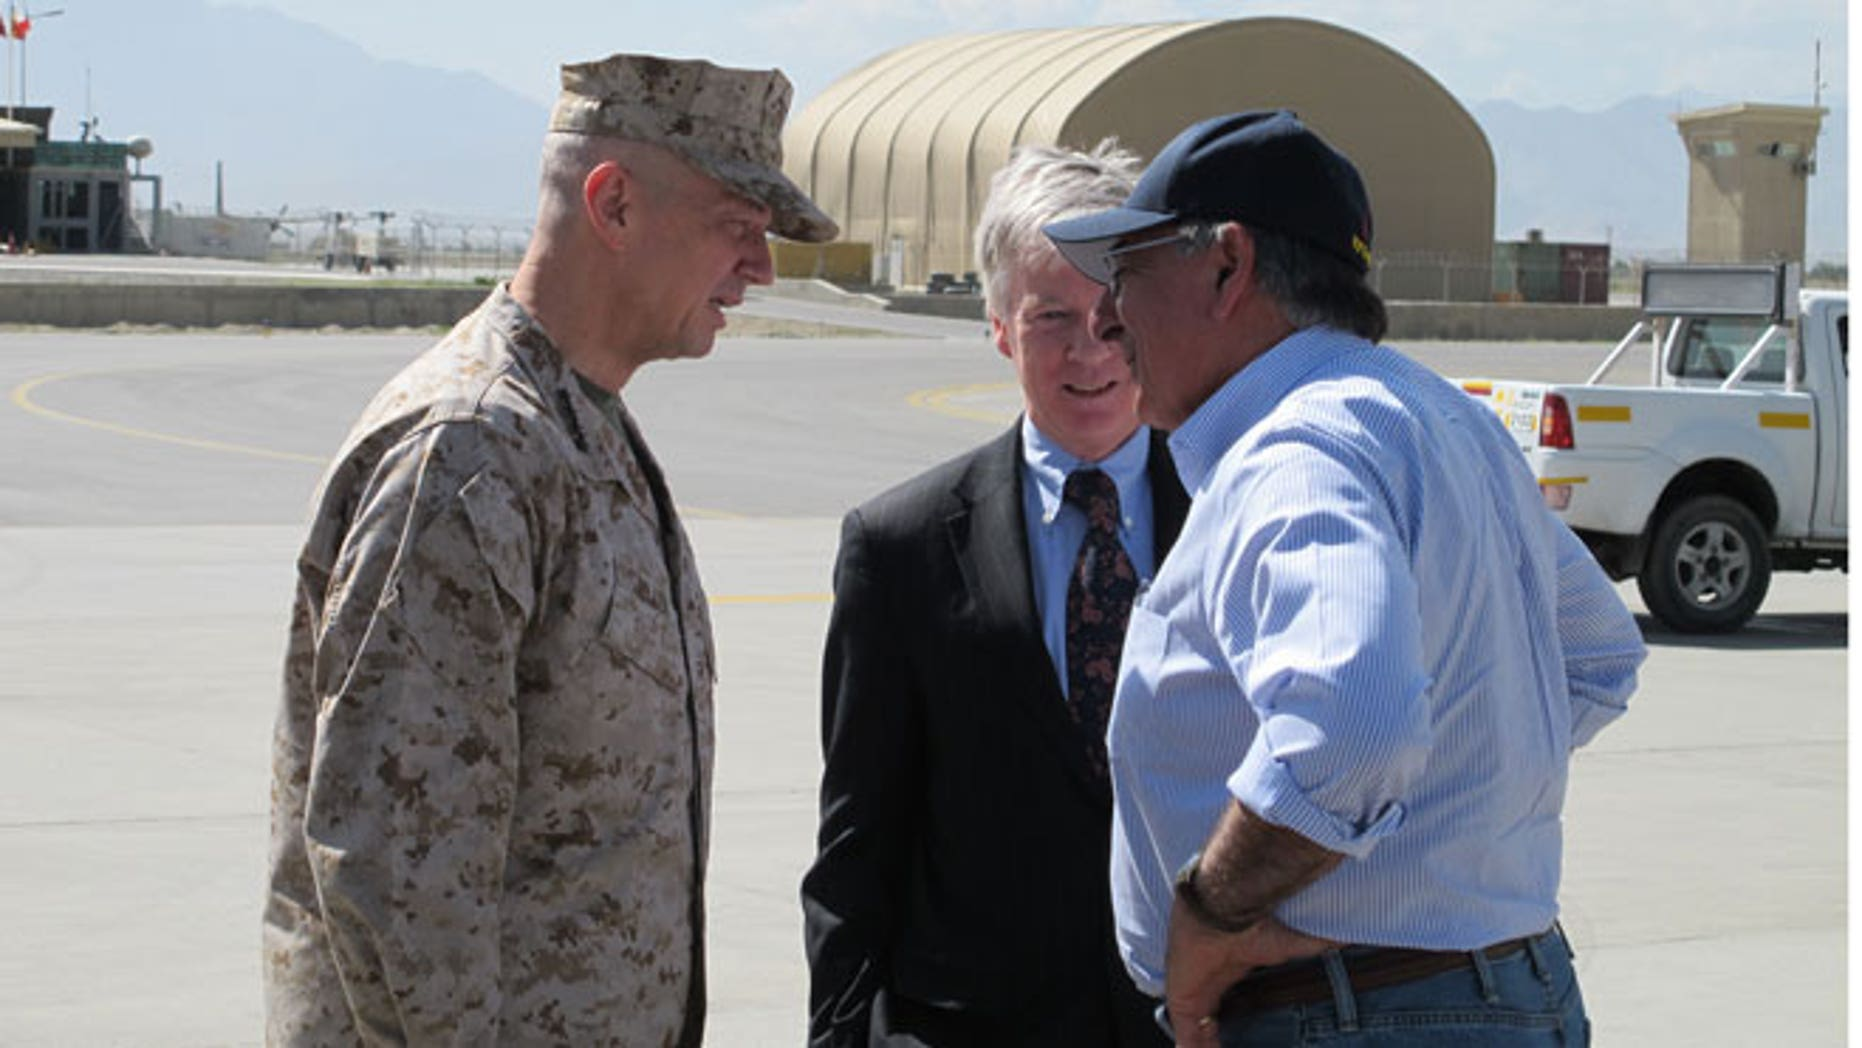 June 7, 2012: Defense Secretary Leon Panetta is greeted by ISAF Commander Gen. John Allen and U.S. Ambassador to Afghanistan, Ryan Crocker in Kabul, Afghanistan.